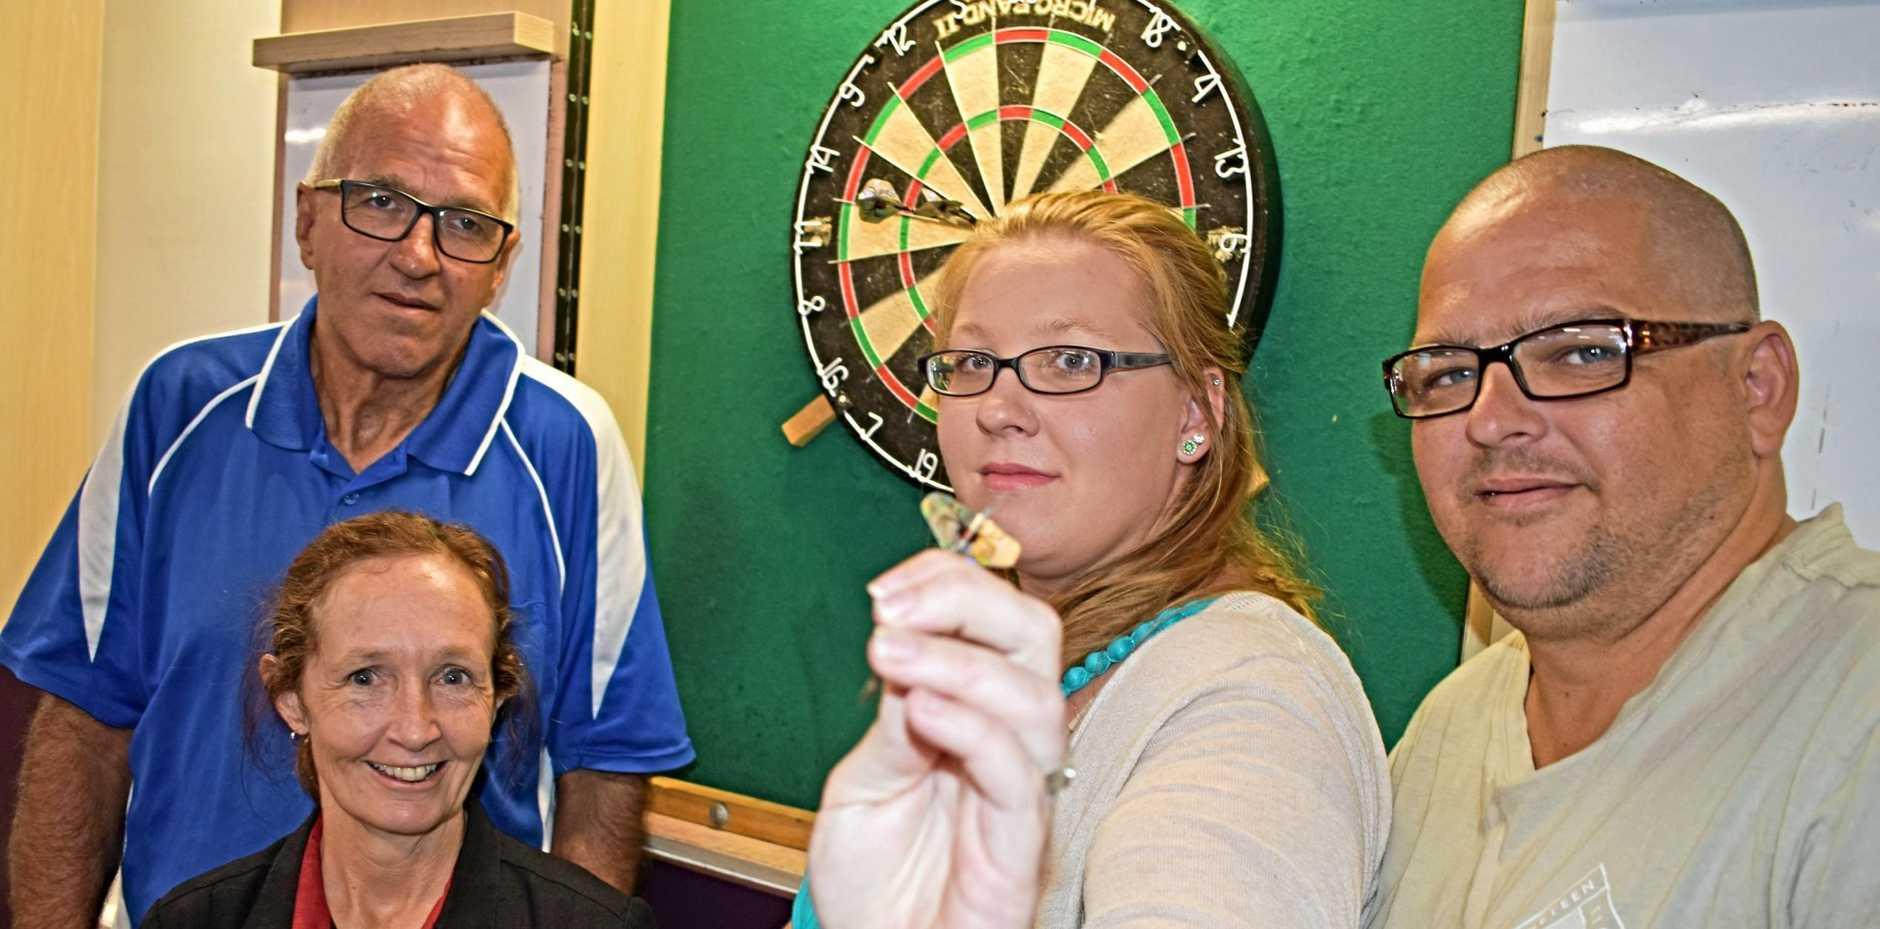 READY FOR ACTION: Darts president Wayne Kliendienst with Stanthorpe RSL's Tina Rays, darts secretary Rachel Fromm and player John Kliendienst.